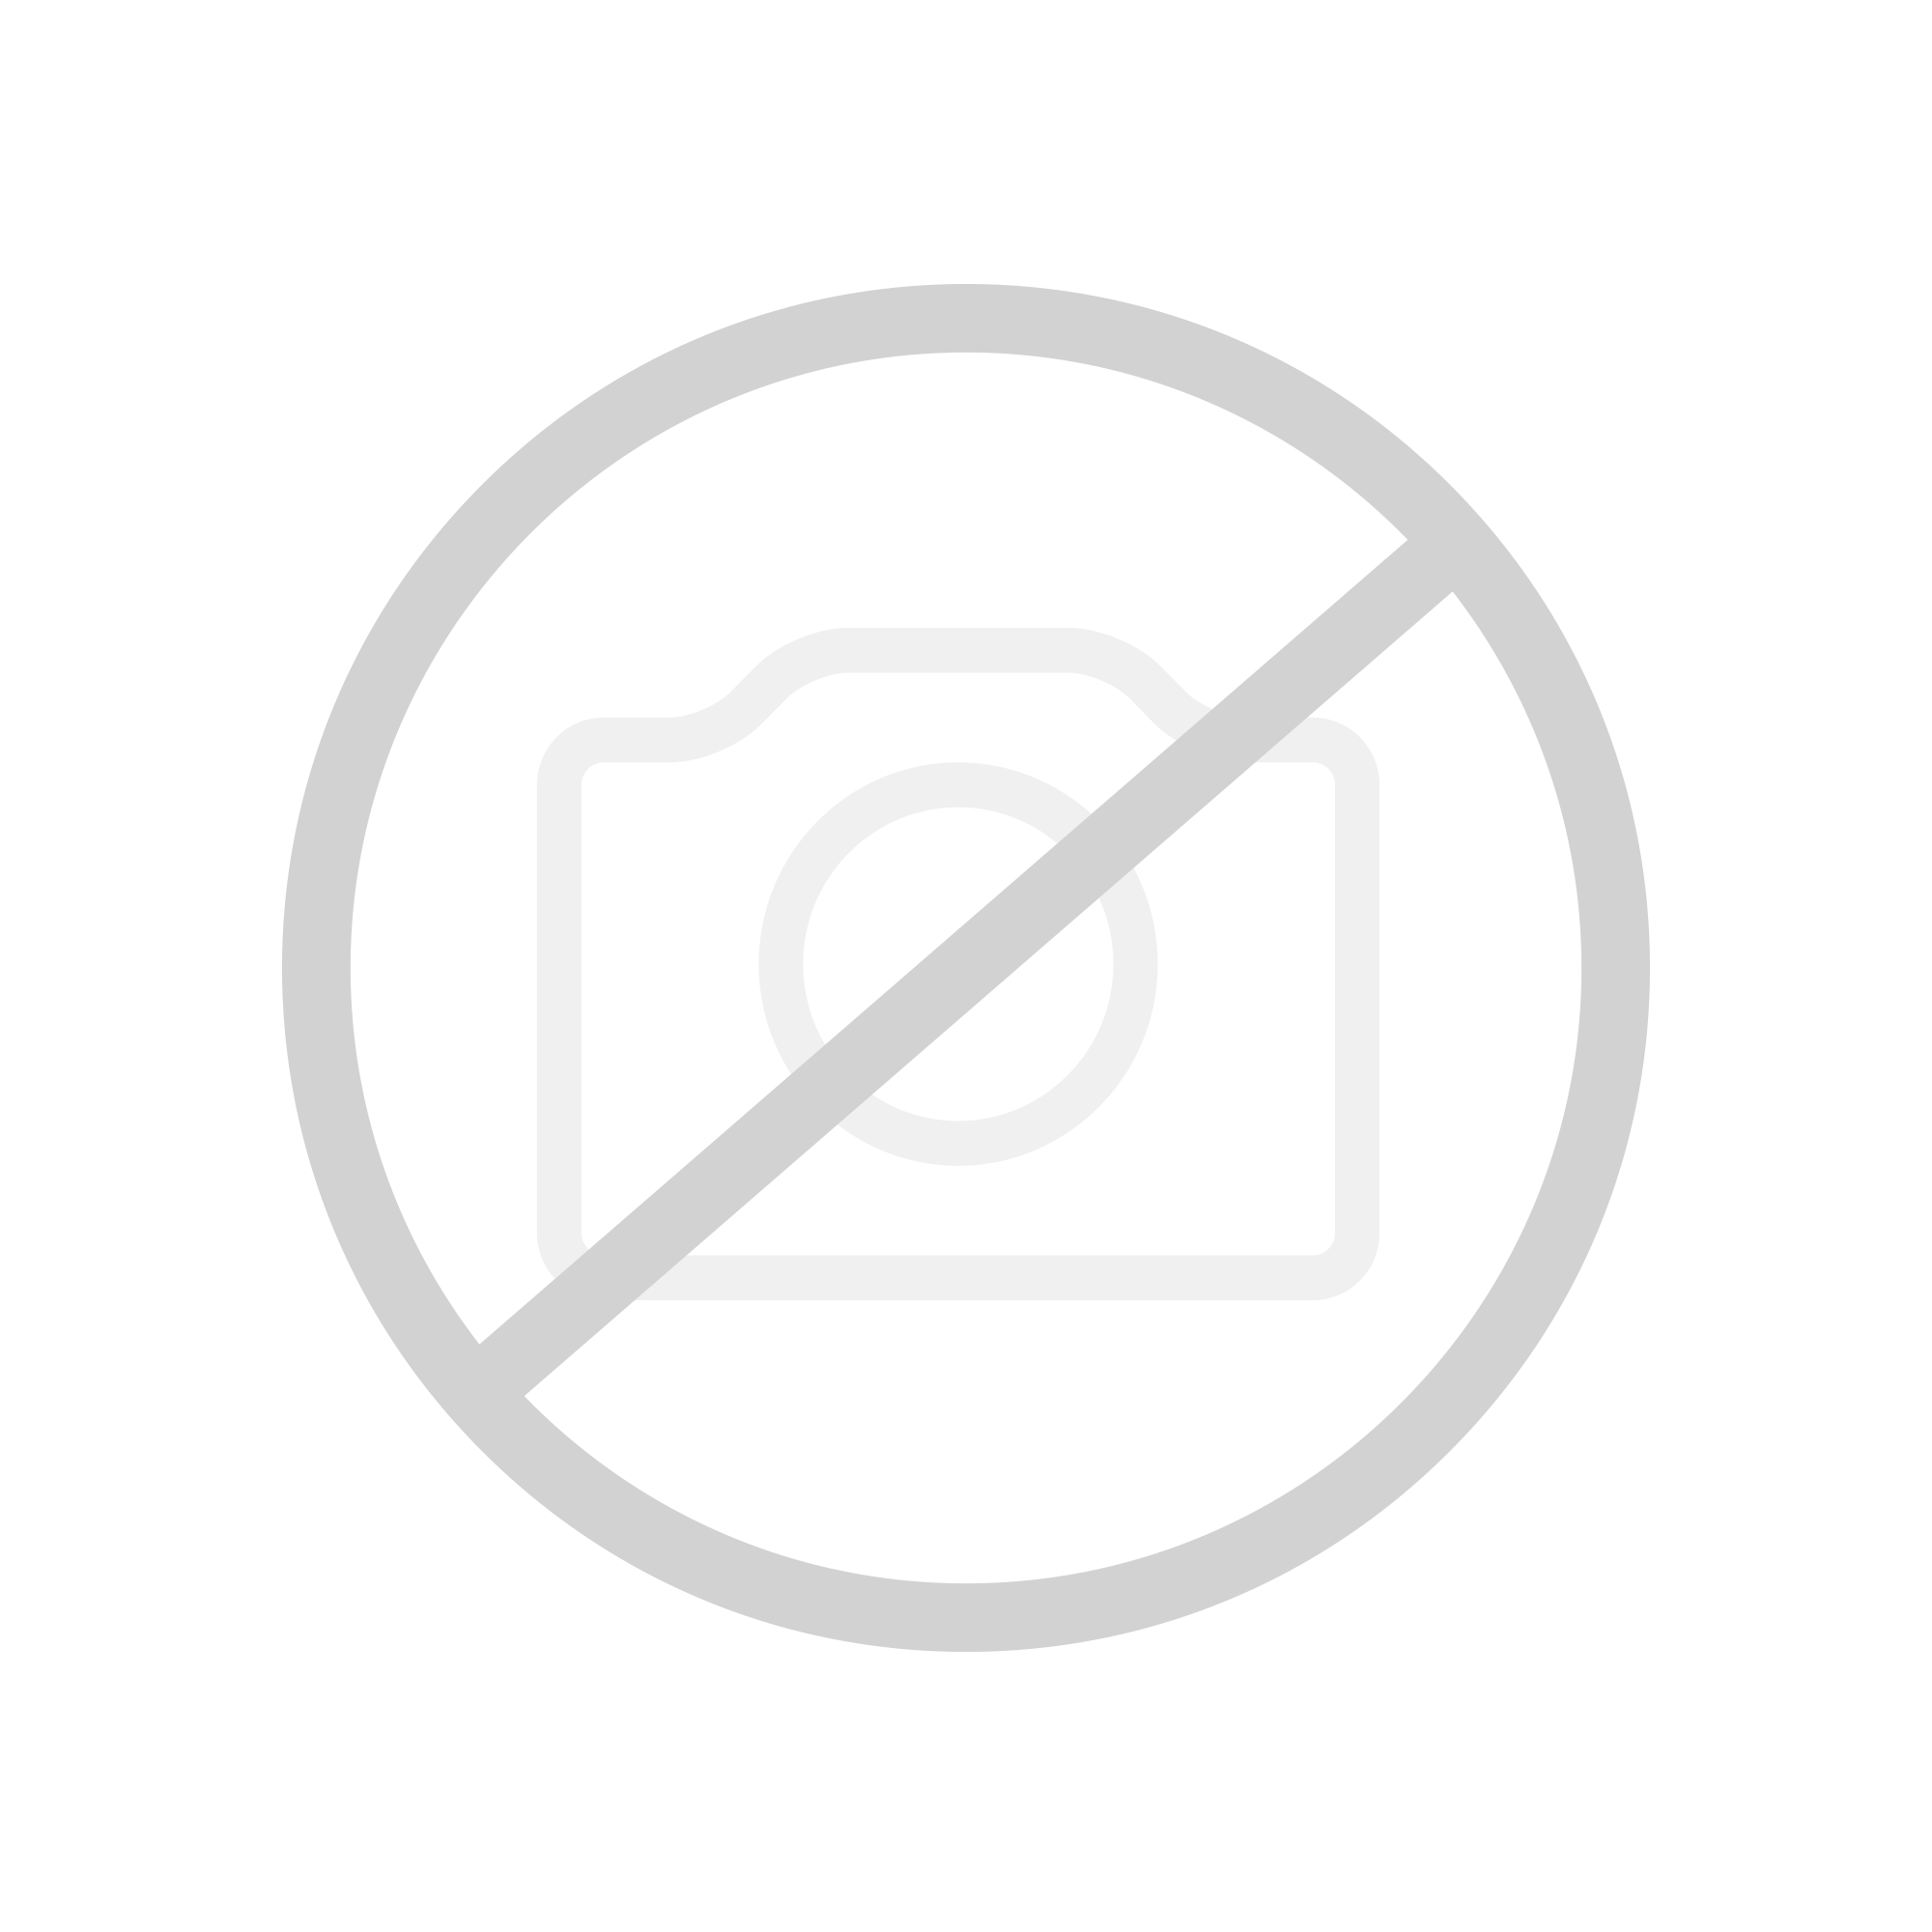 COR SINUS Sessel mit Armlehnen